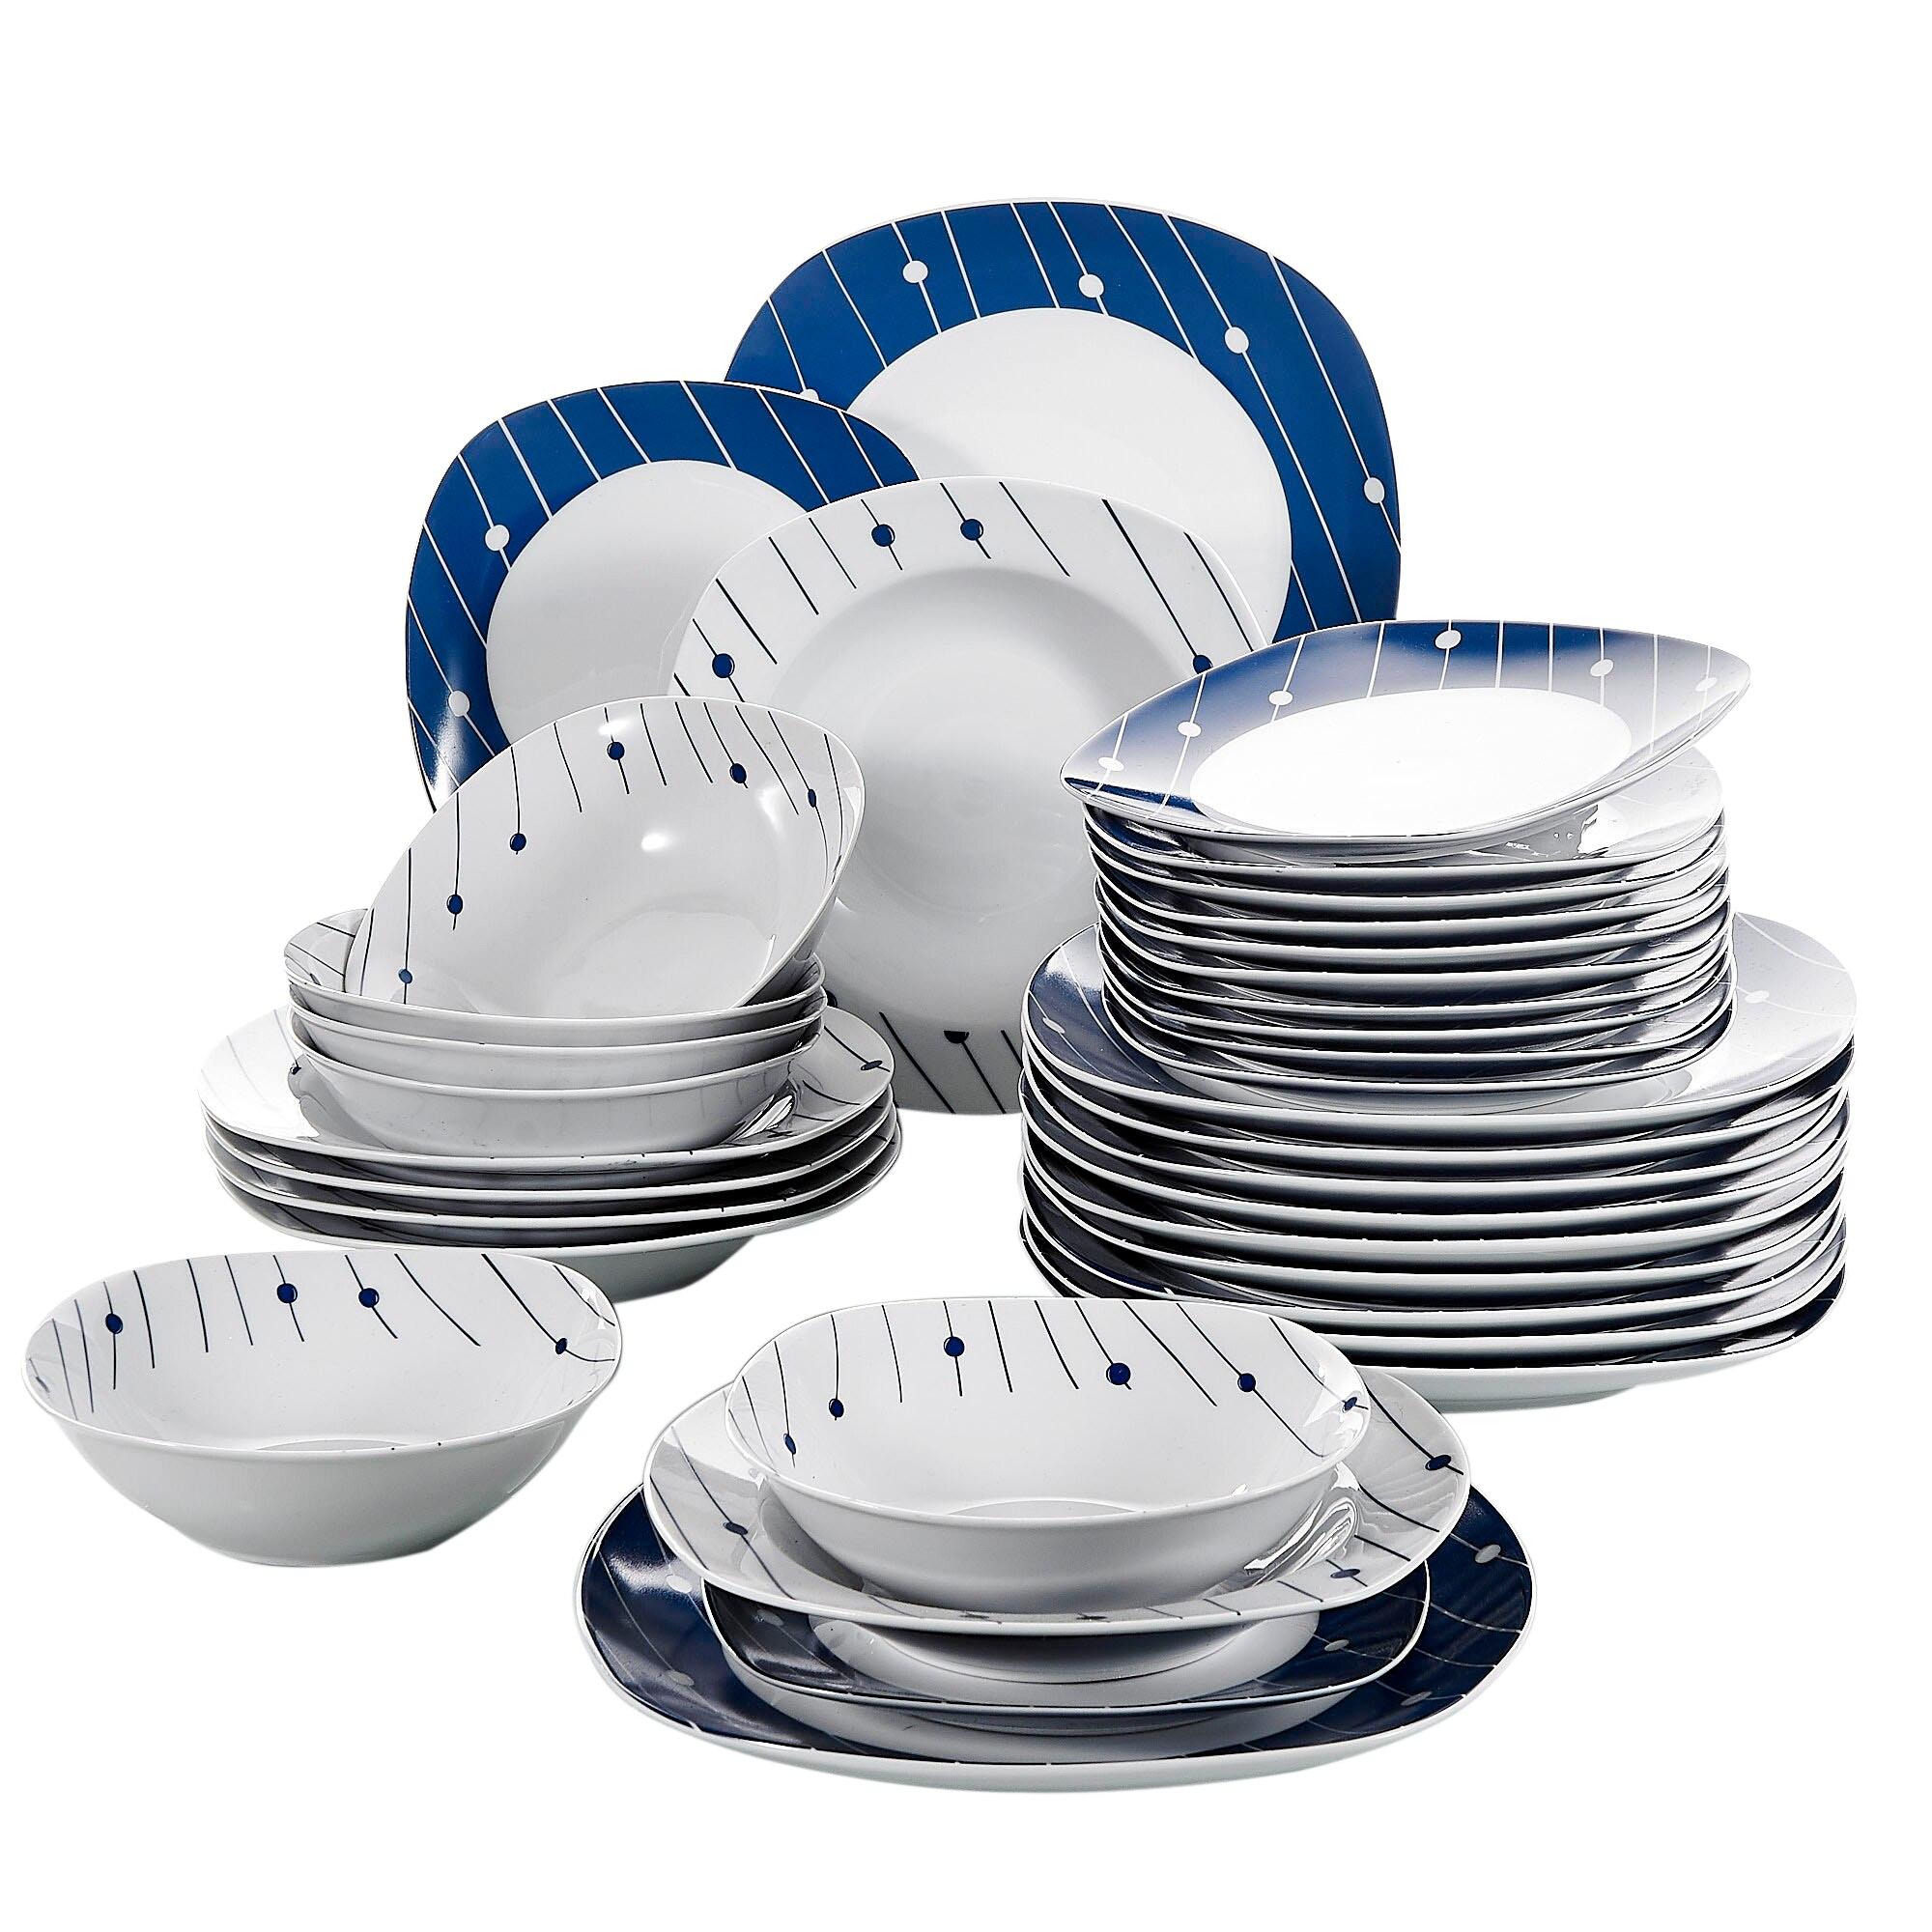 VEWEET DOT002 48-Piece Dinner Set China Ceramic Dinnerware Plate Tableware Set with Bowl,Dessert Plate,Soup Plate,Dinner Plate